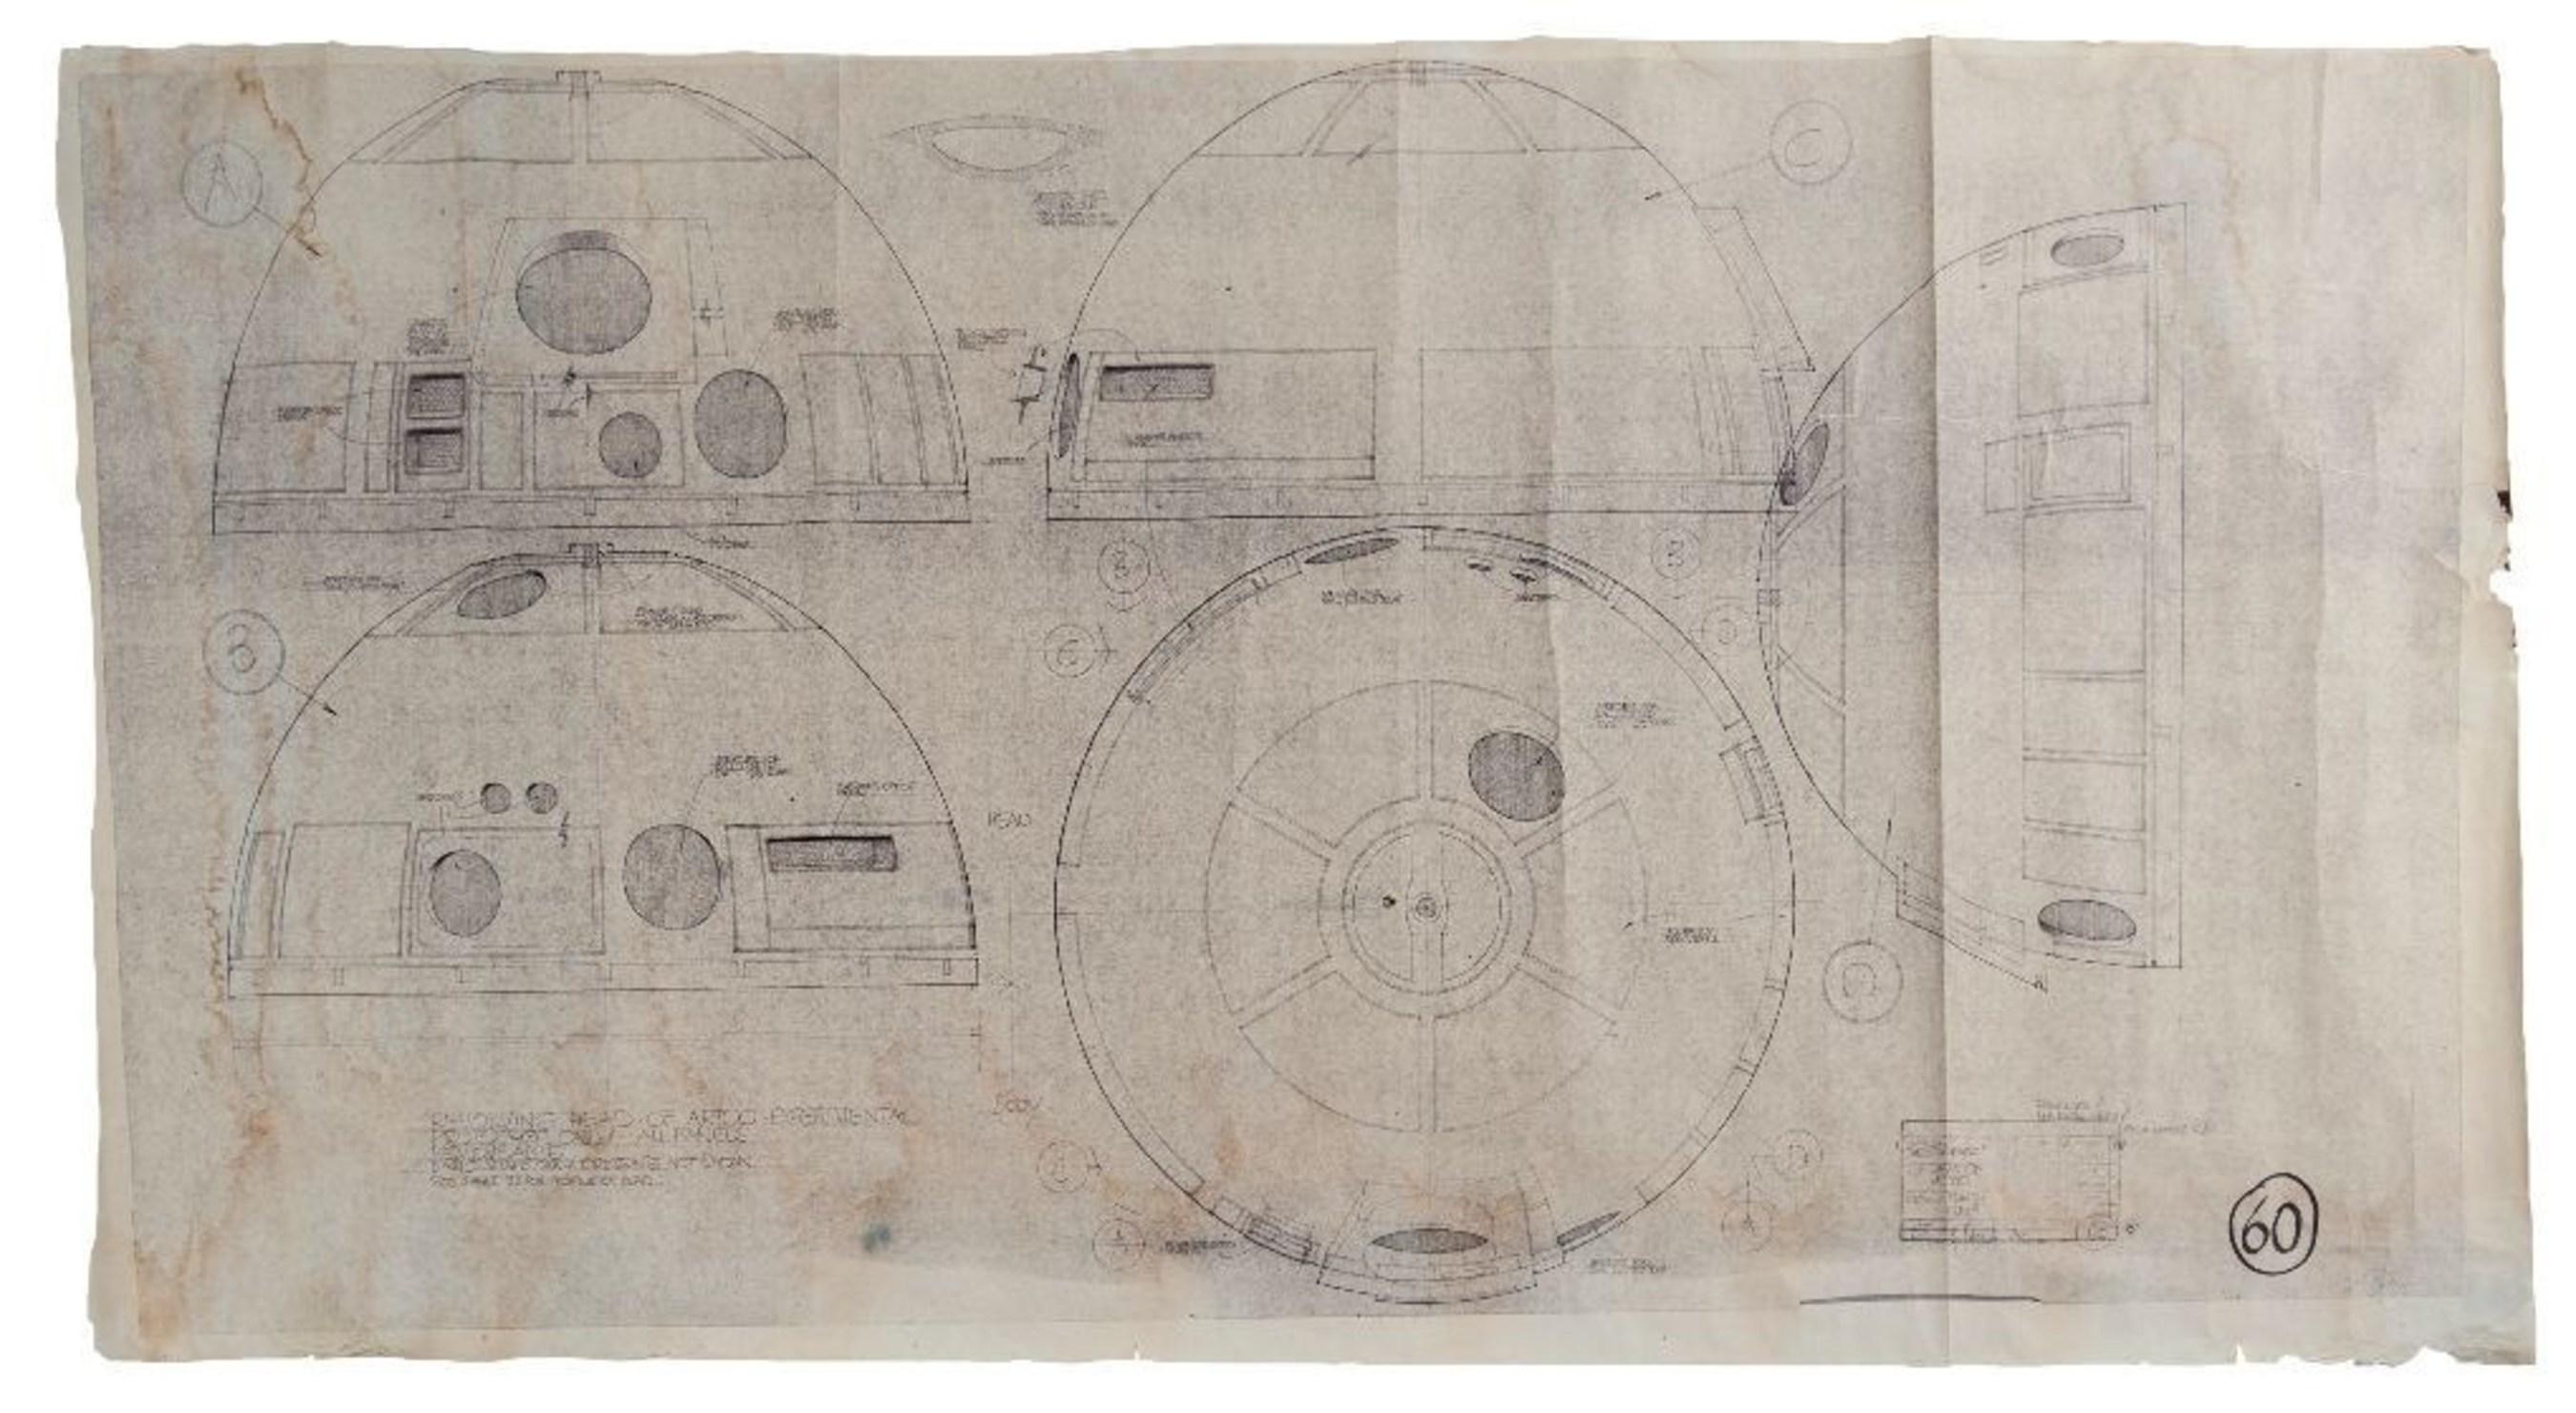 Rare Original Star Wars R2-D2 Blueprint Up for Auction Through November 14th at